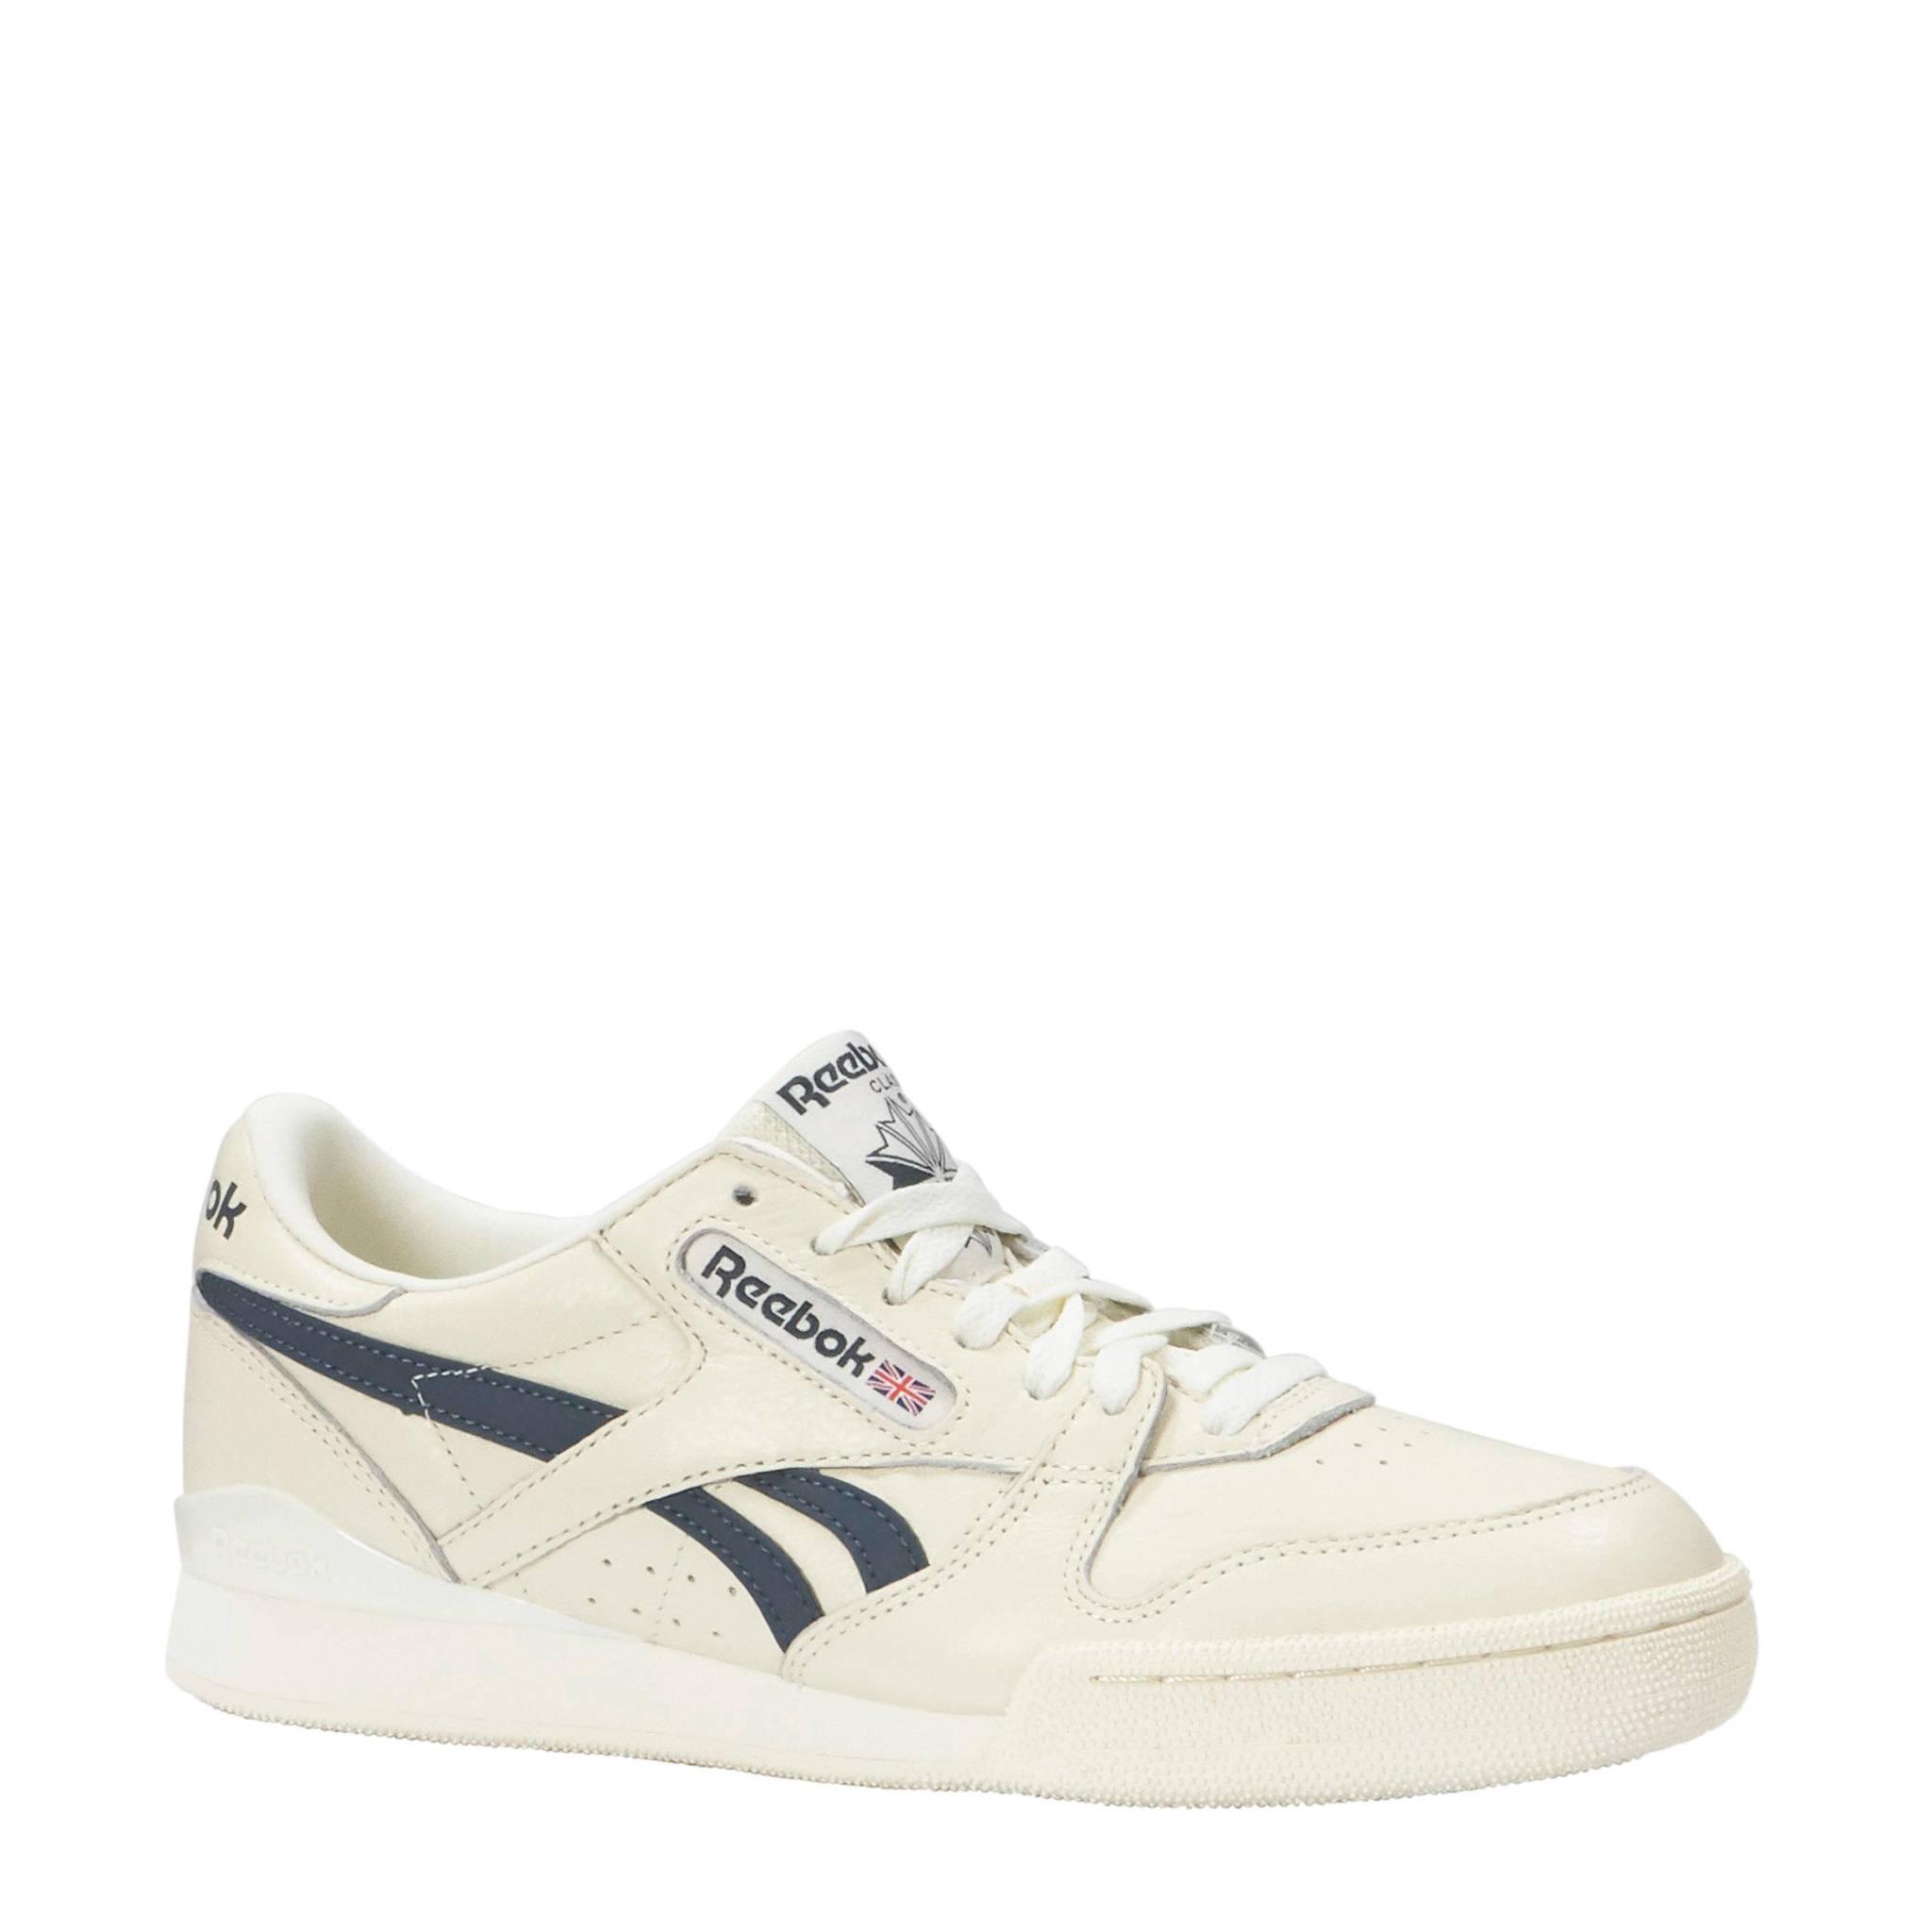 b83f14816a2 Reebok leren sneakers wit | wehkamp